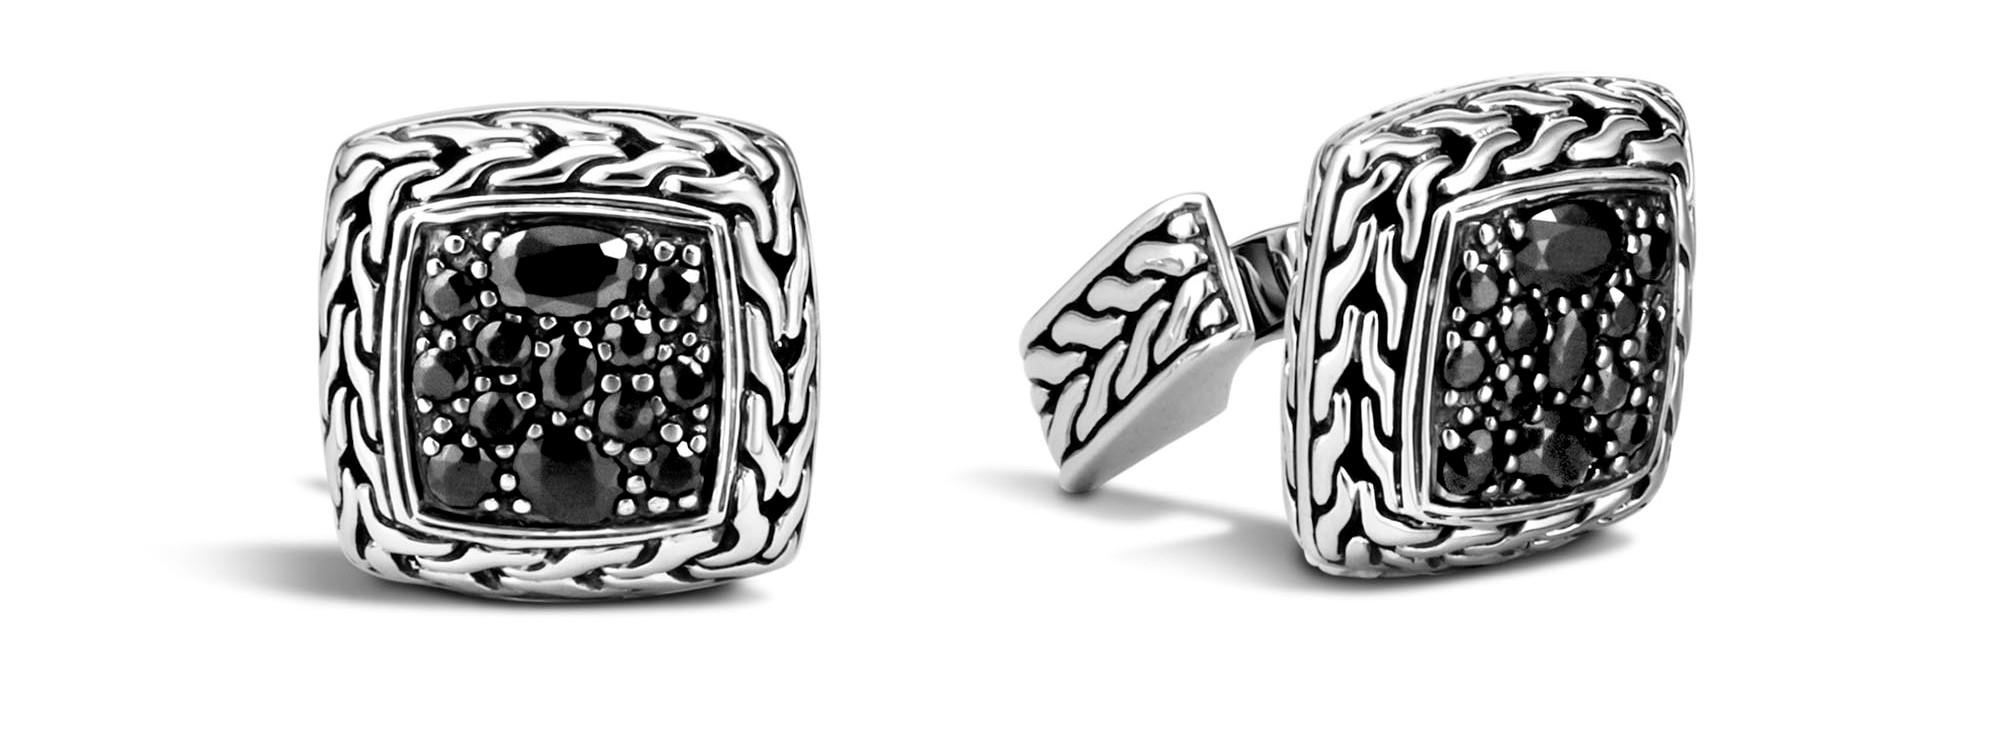 John Hardy cufflinks available at Diamond Design